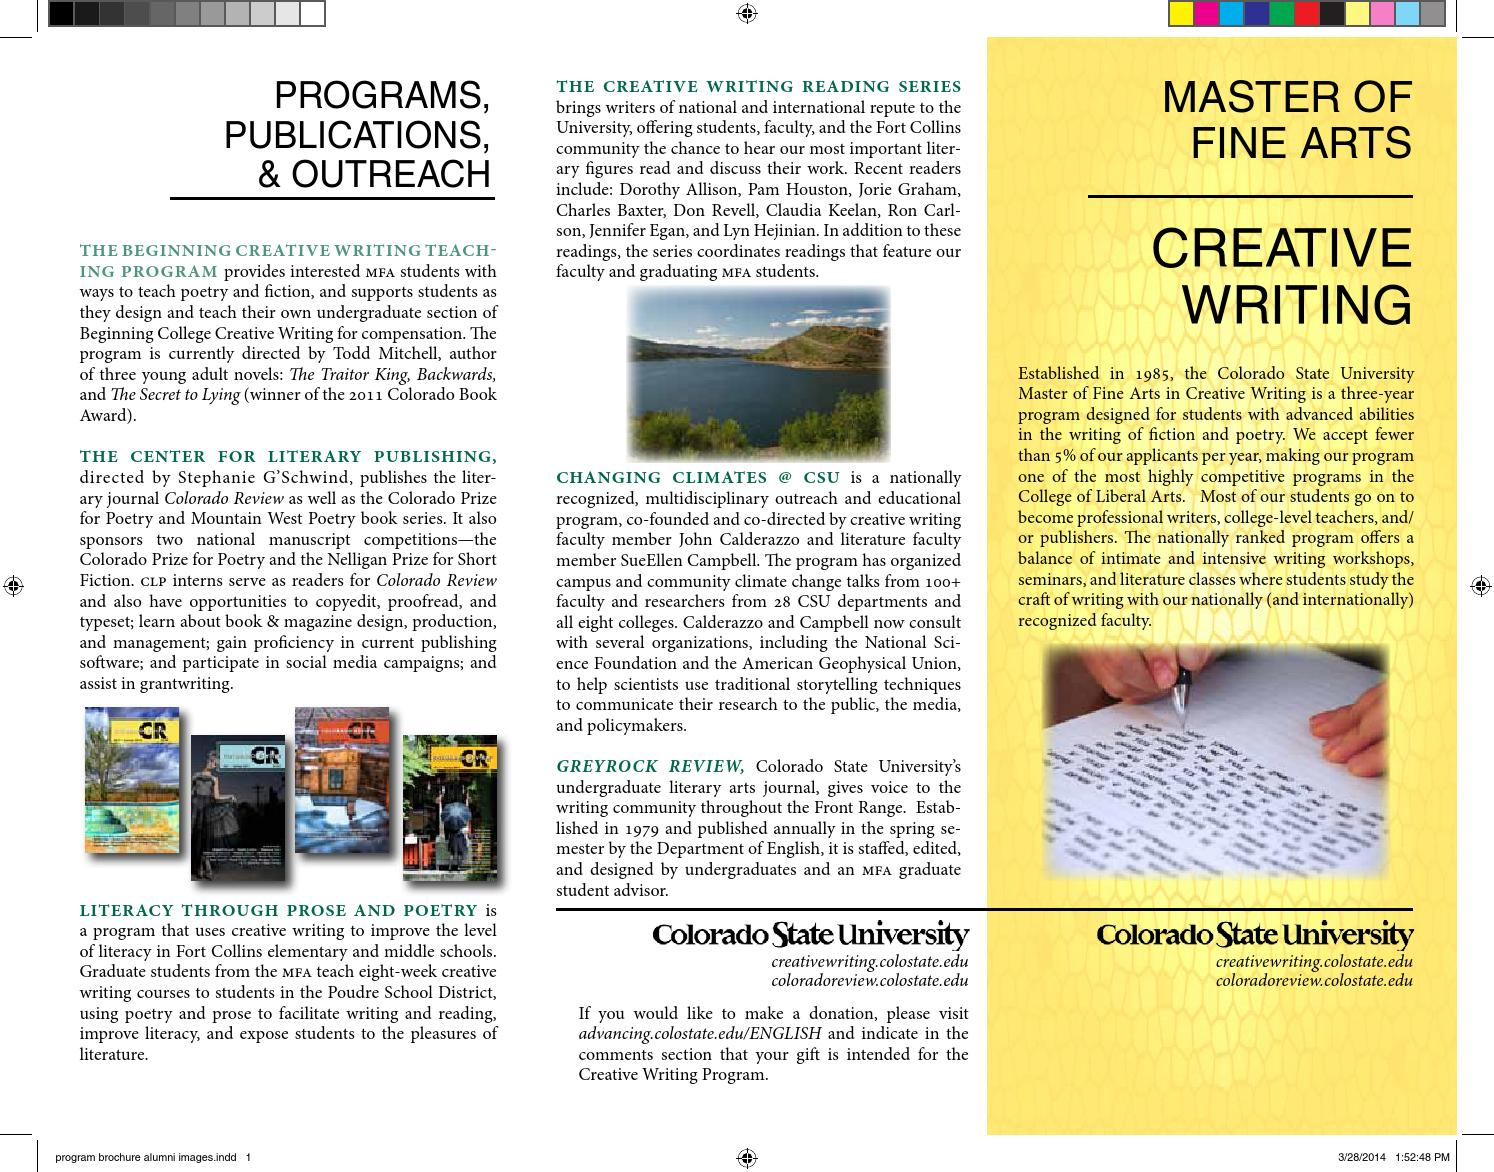 mfa creative writing rankings 2014